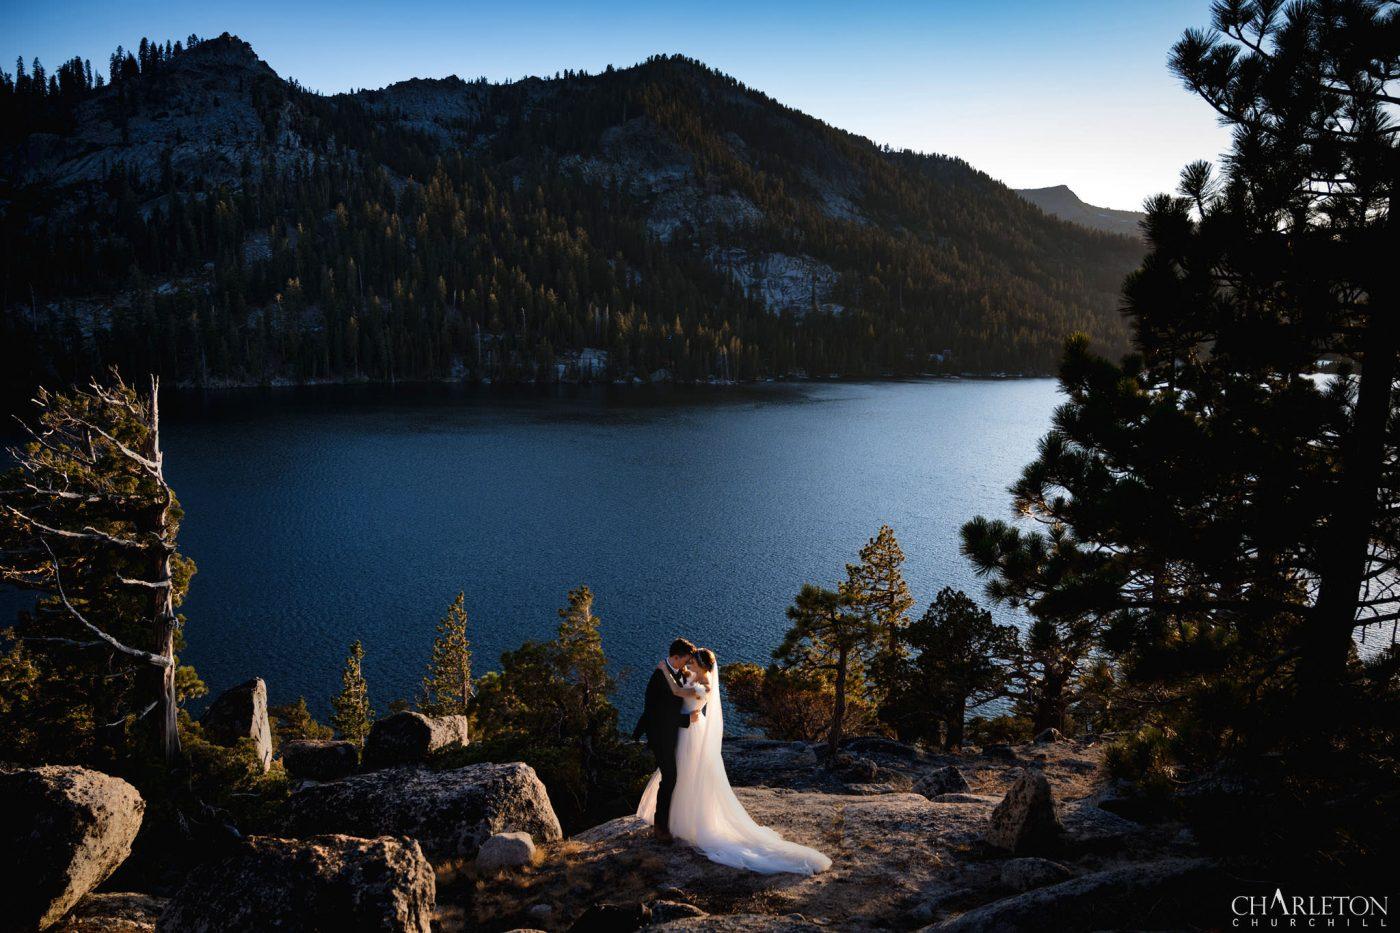 lake tahoe adventure photographer session on granite mountain peak for epic wedding photos